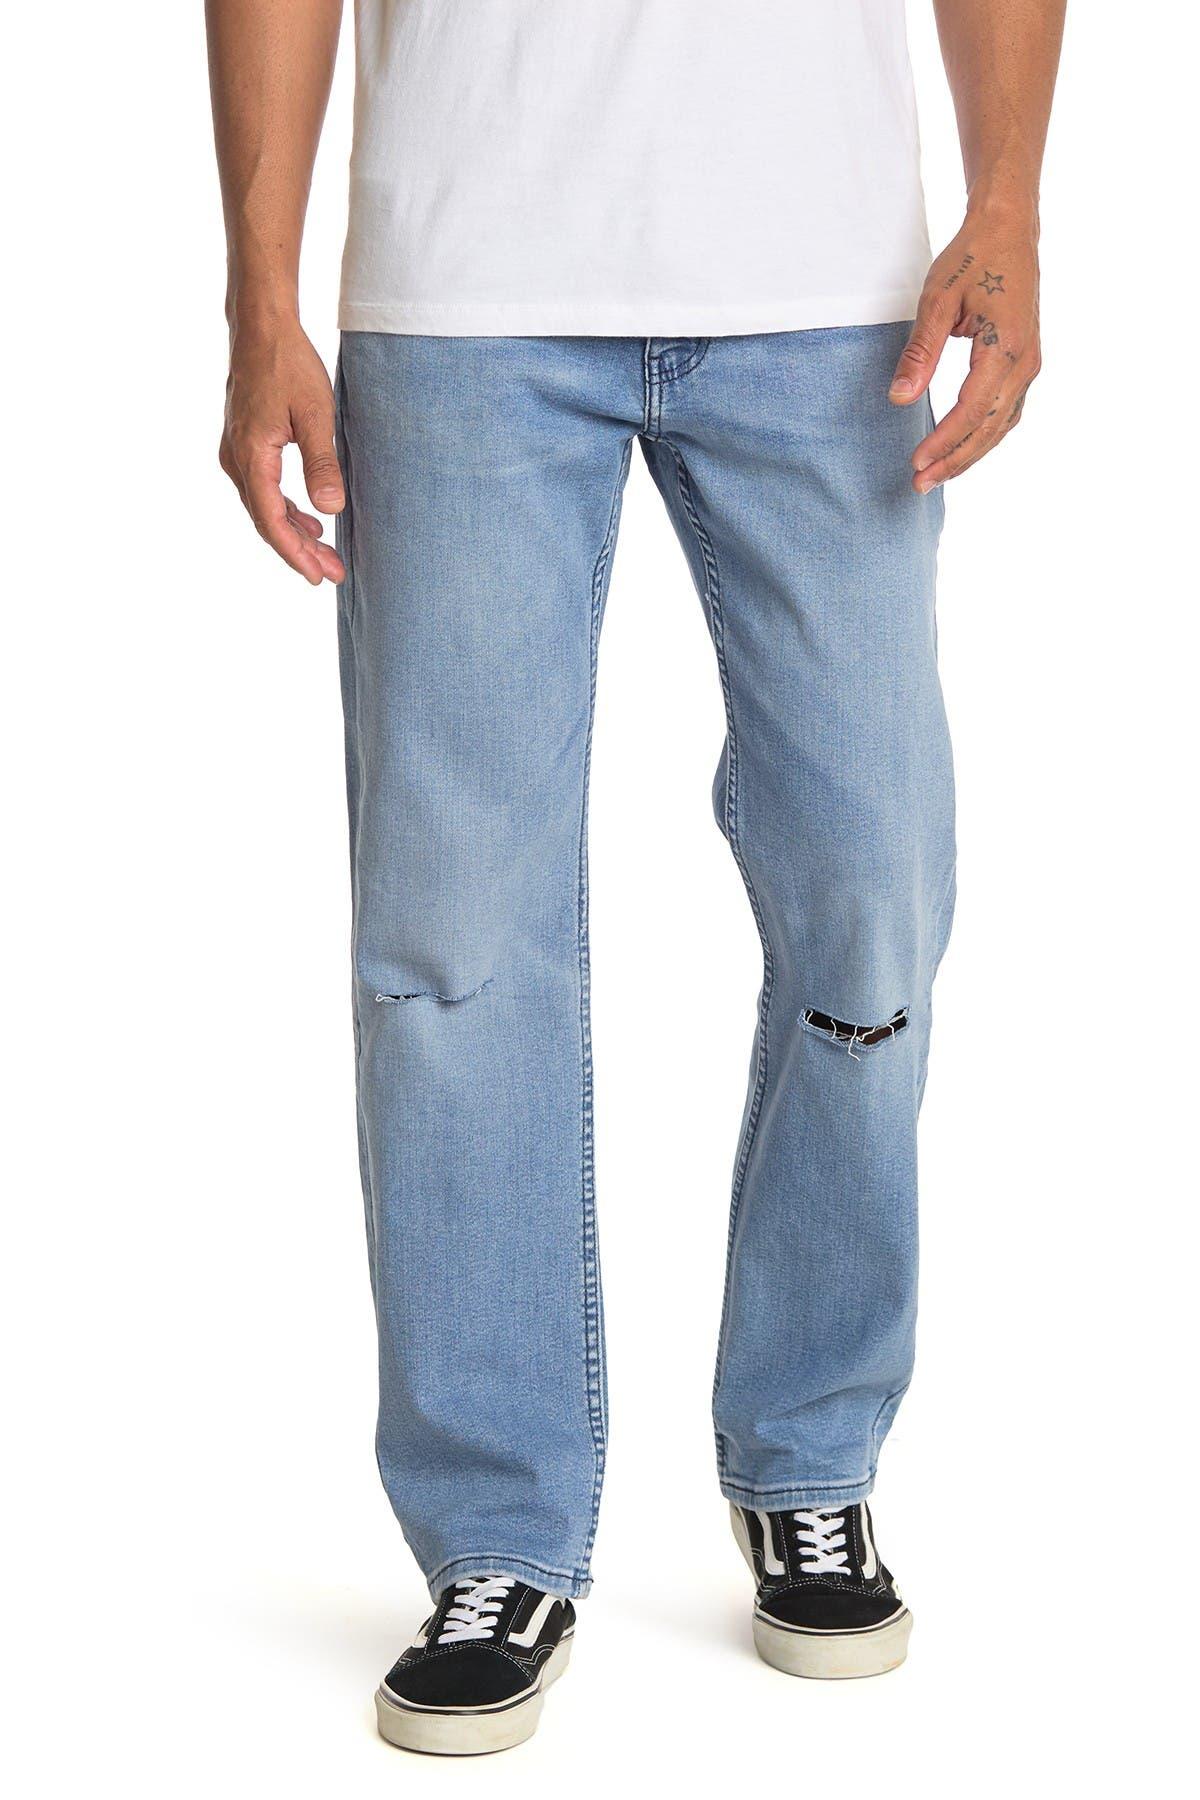 Image of Levi's Straight Leg Homestead Jeans